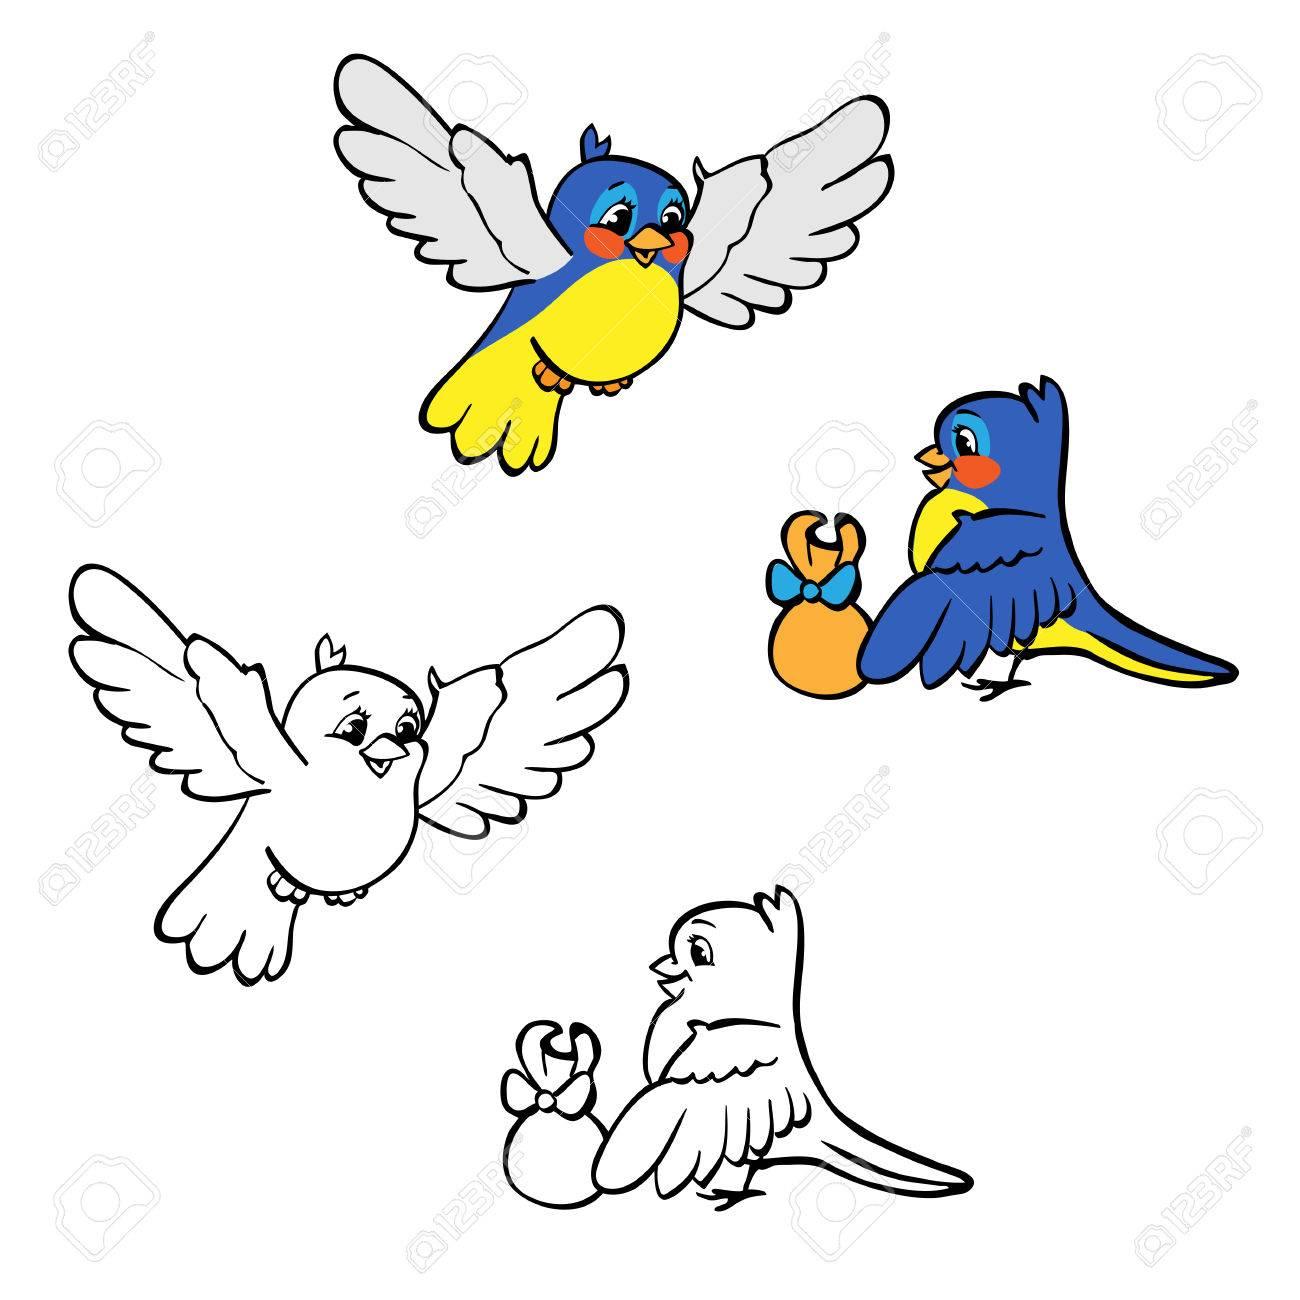 Magnífico Pájaro Azul Para Colorear Patrón - Dibujos Para Colorear ...